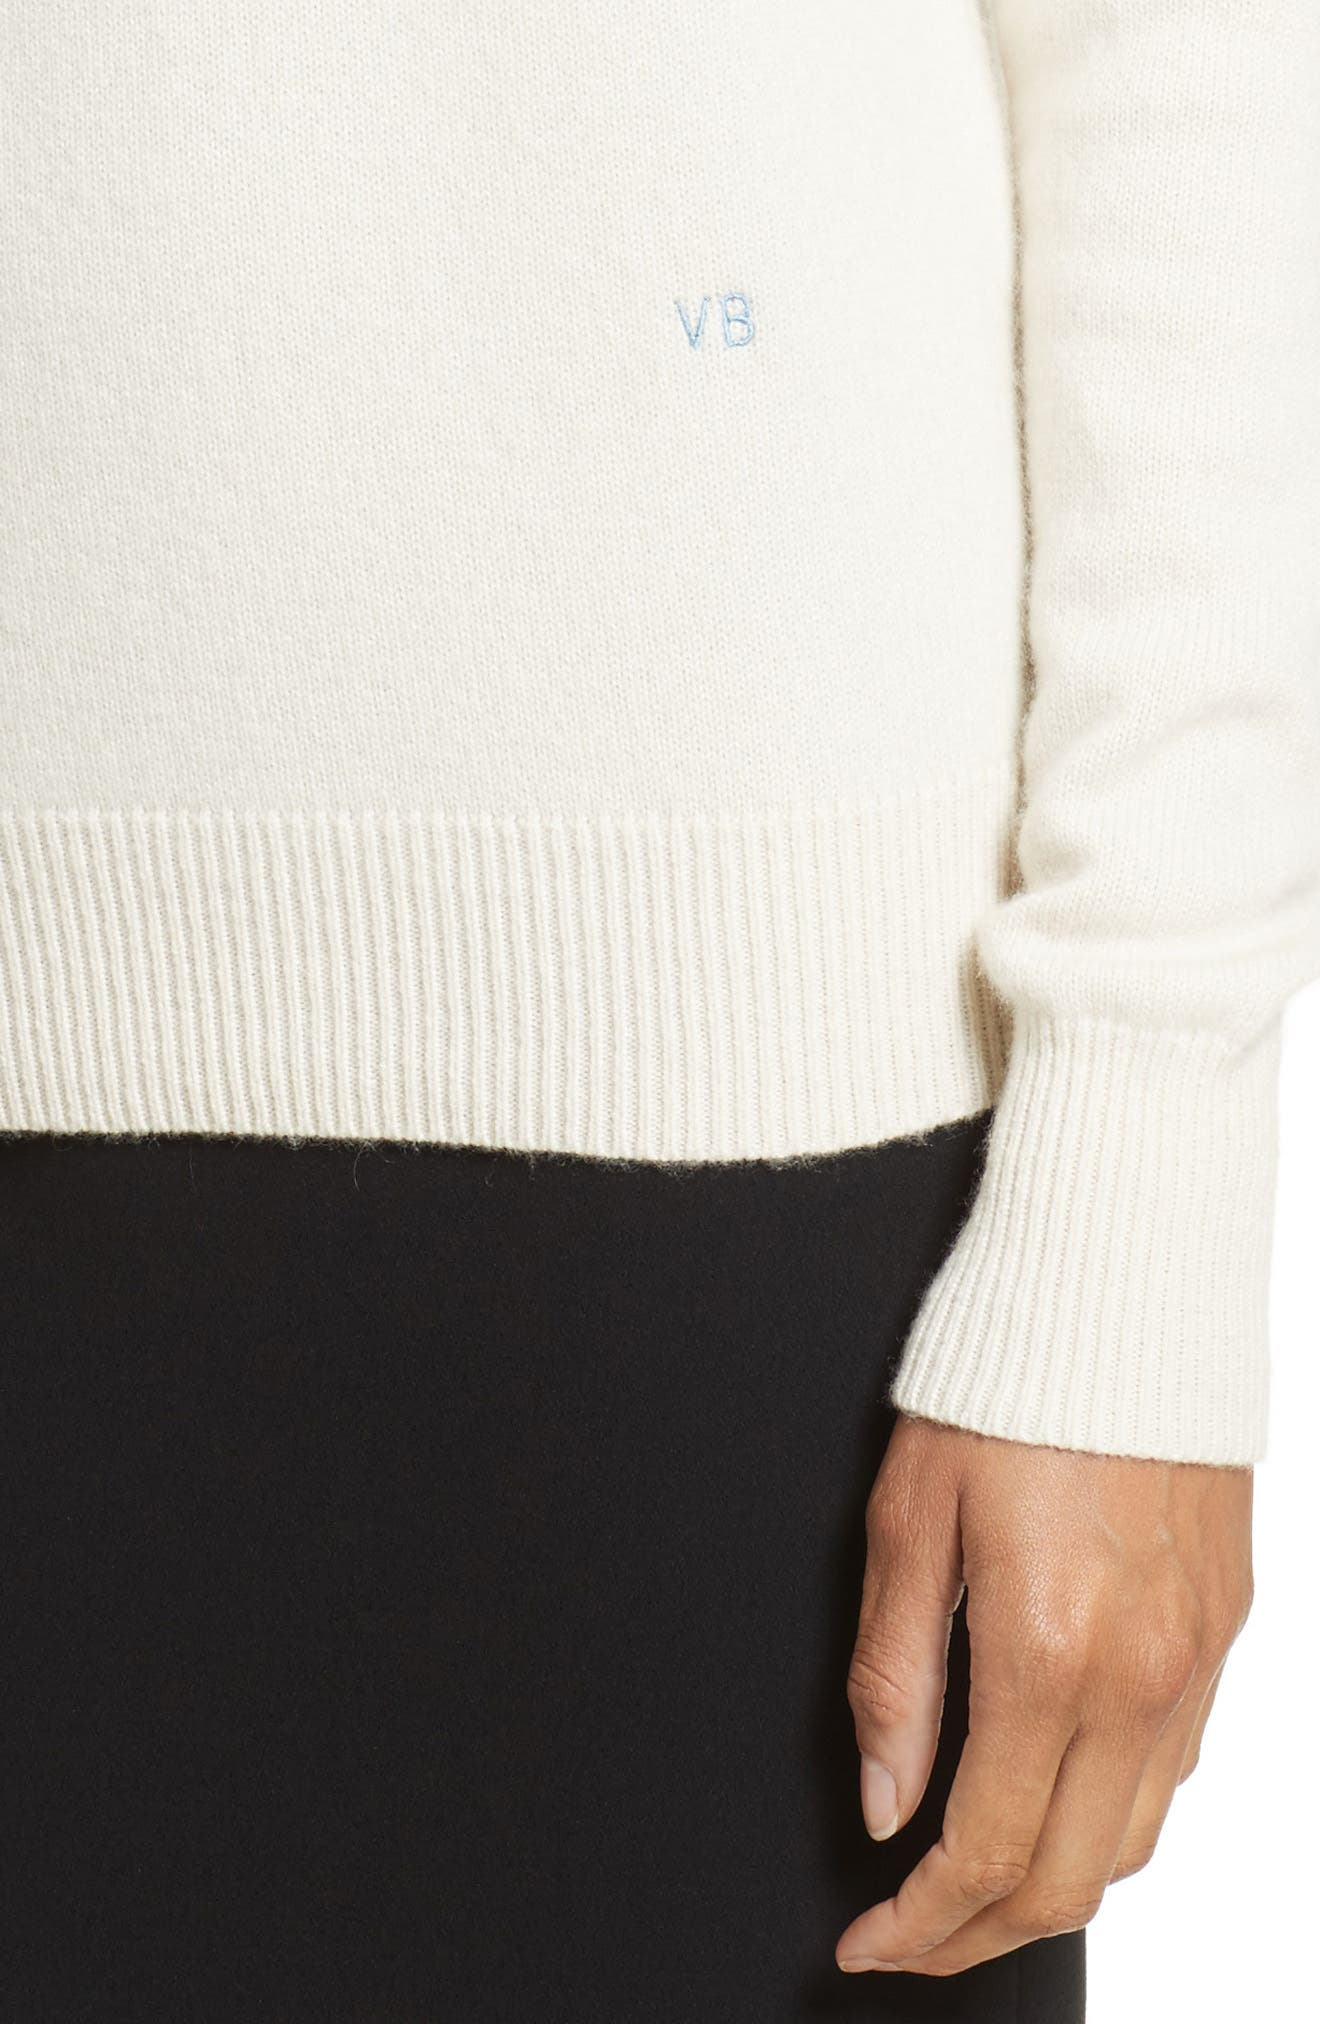 VICTORIA BECKHAM, Cashmere Turtleneck Sweater, Alternate thumbnail 4, color, VANILLA